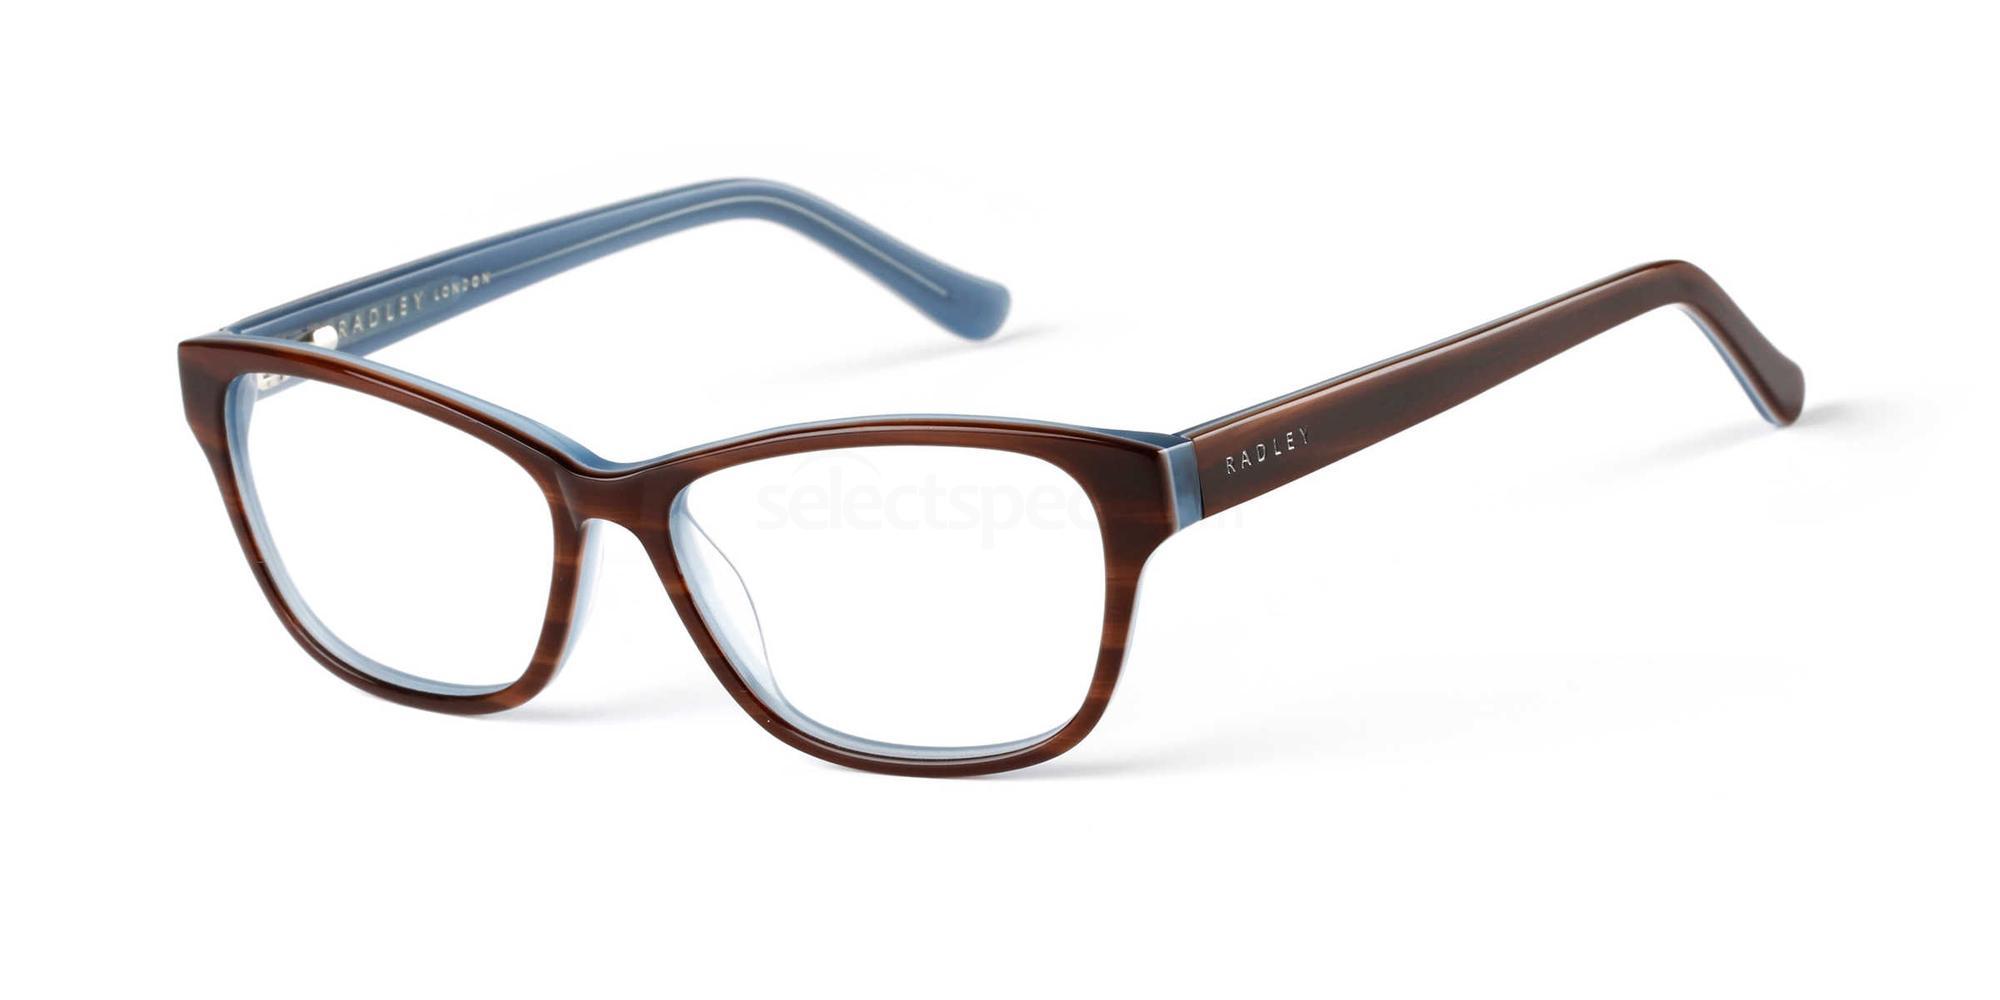 101 RDO-15512 Glasses, Radley London